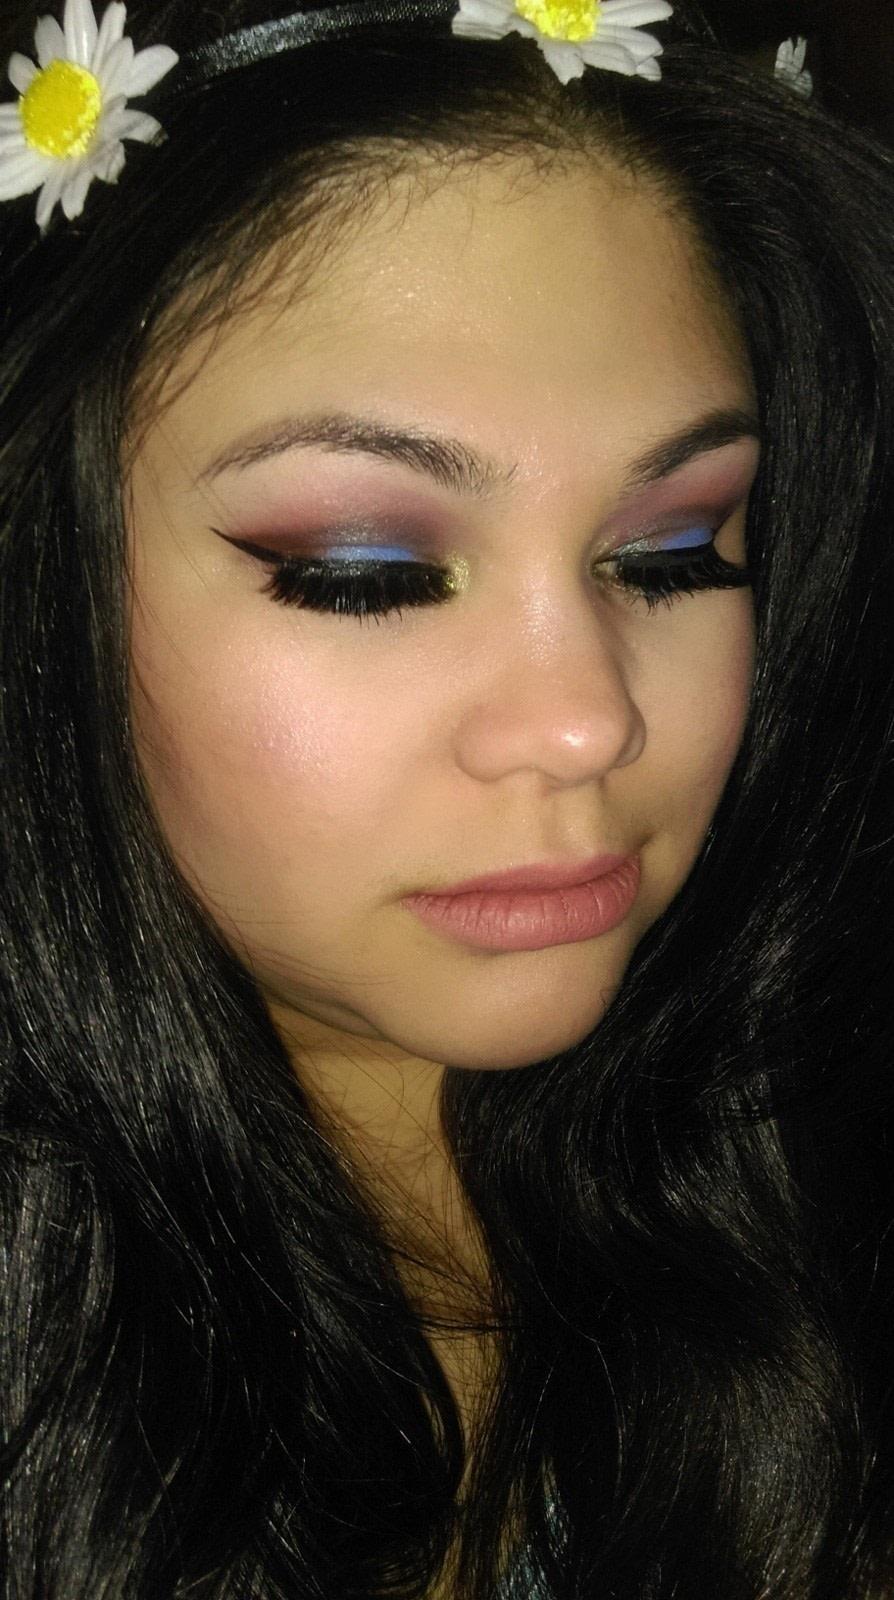 Limecrime Venus 2 Colorful Smokey Eye 183 How To Create A